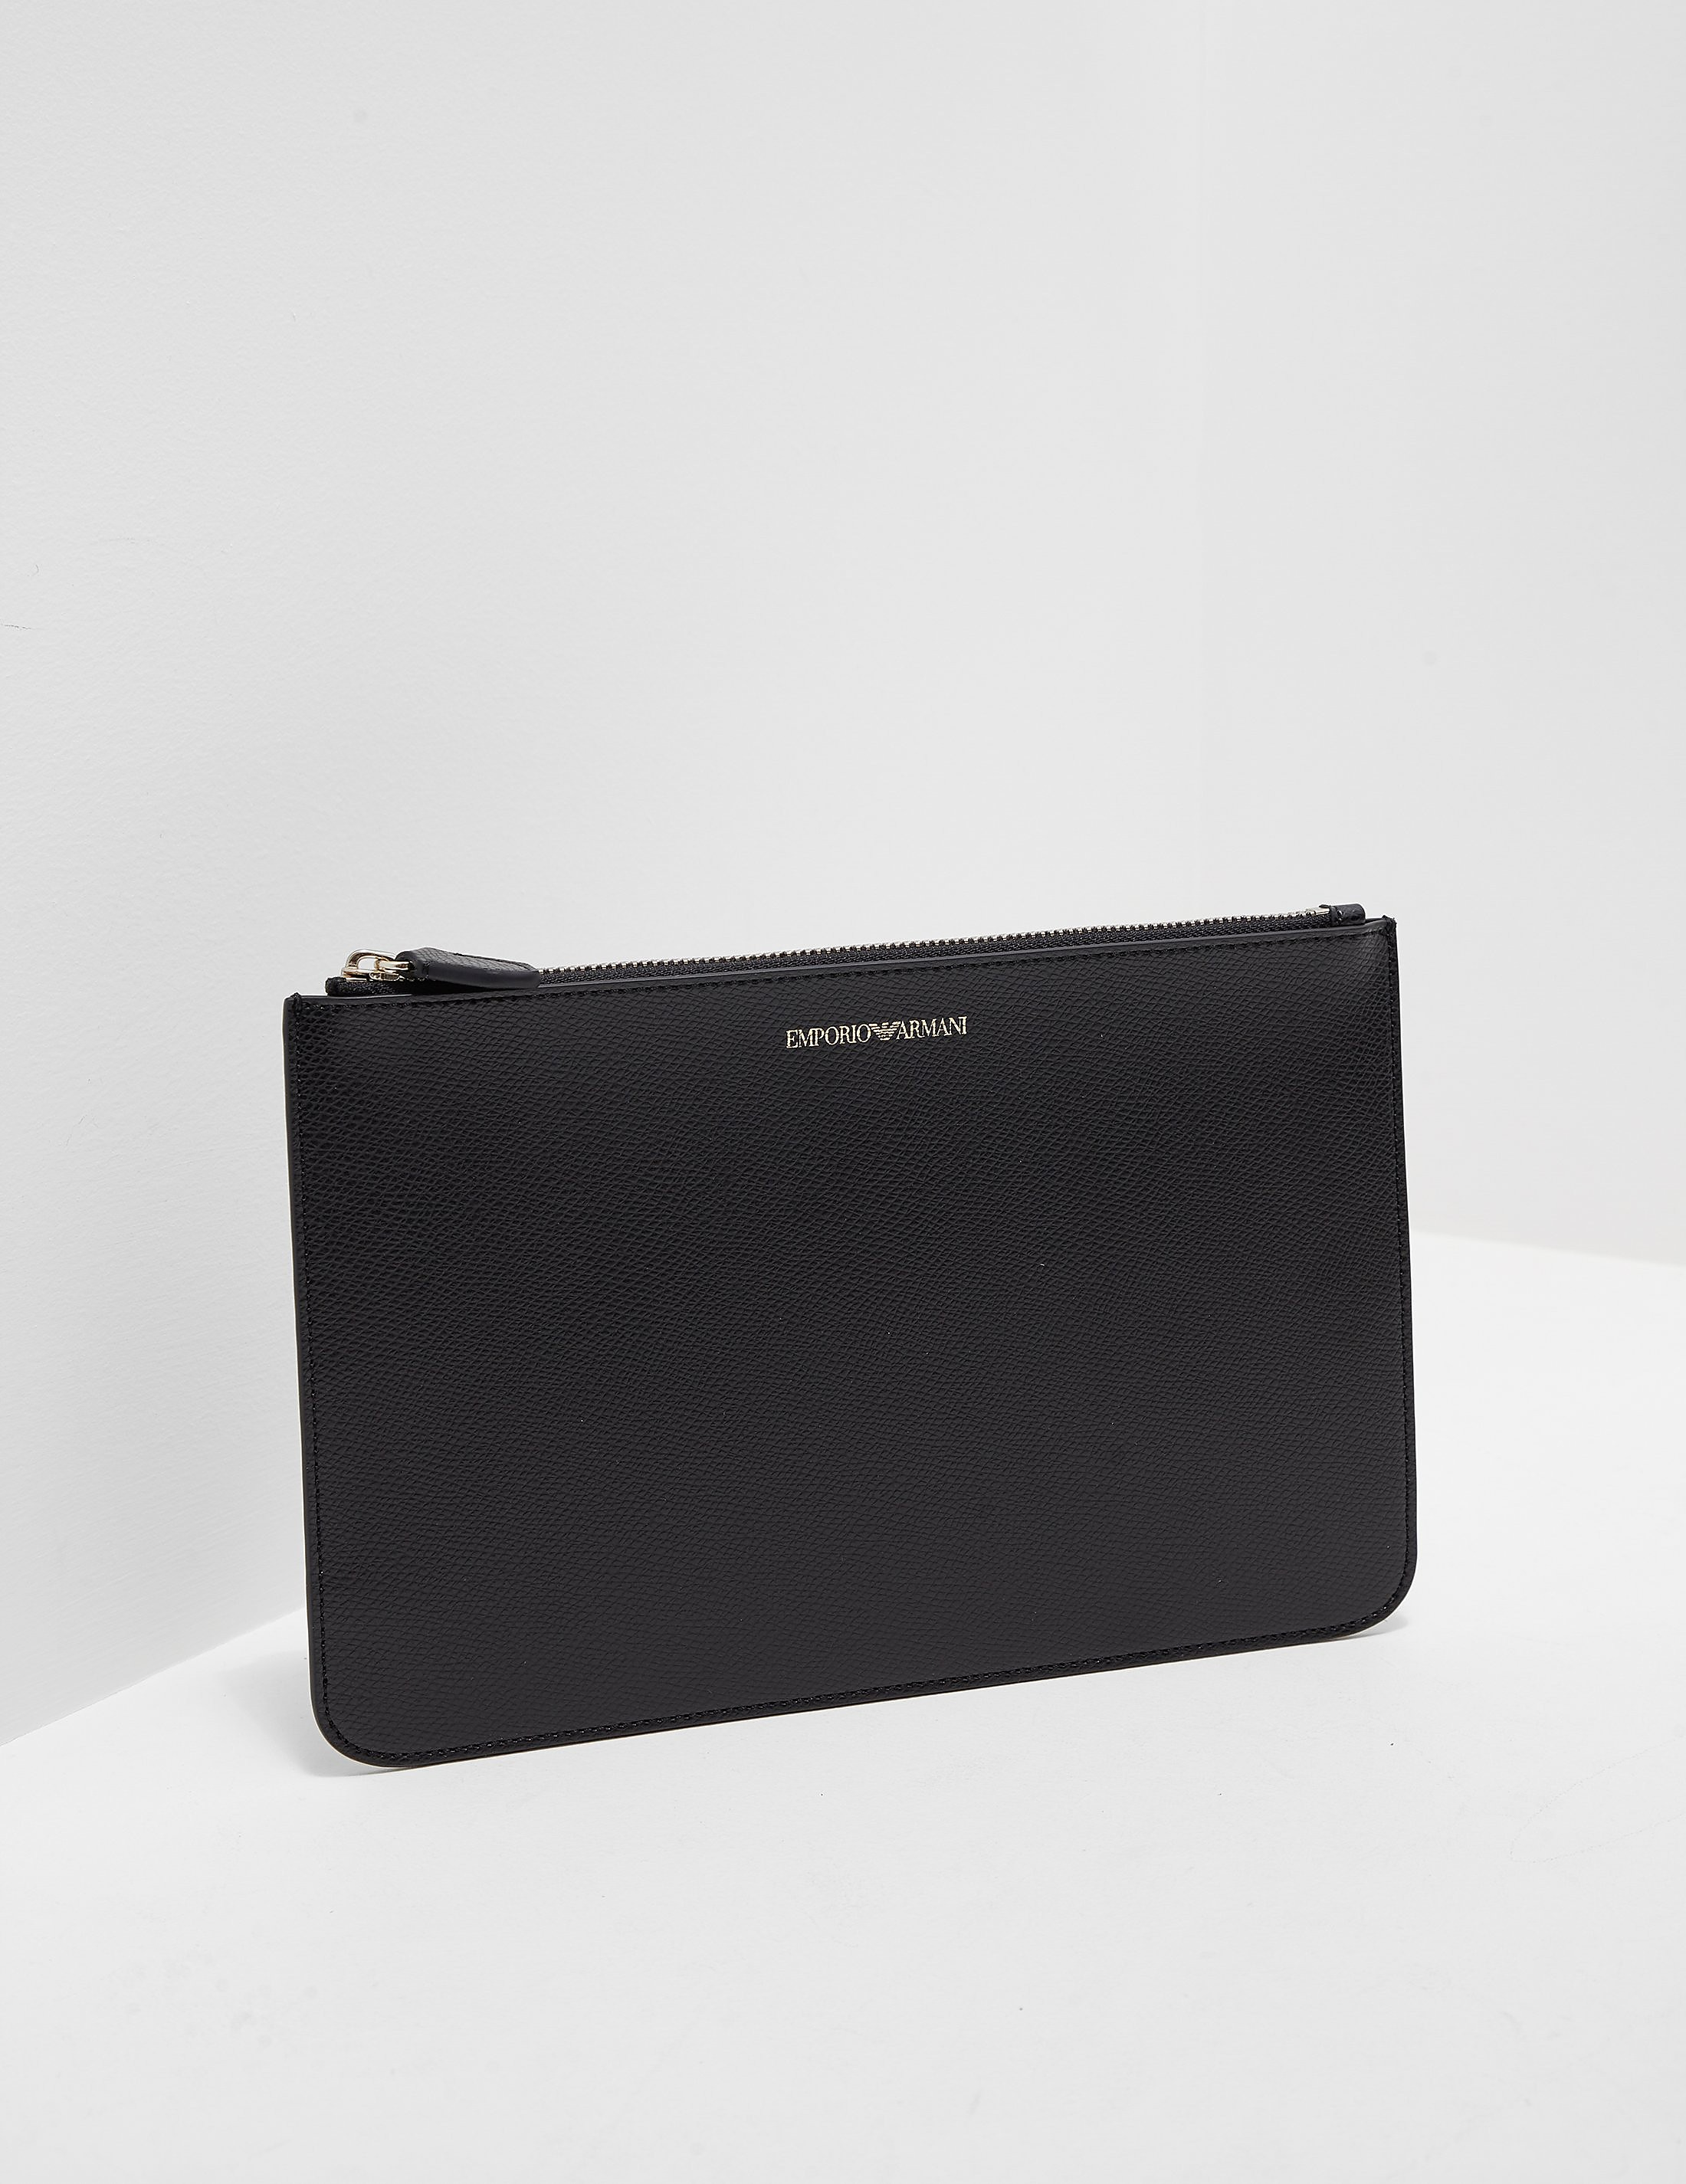 Emporio Armani Busta Clutch Bag